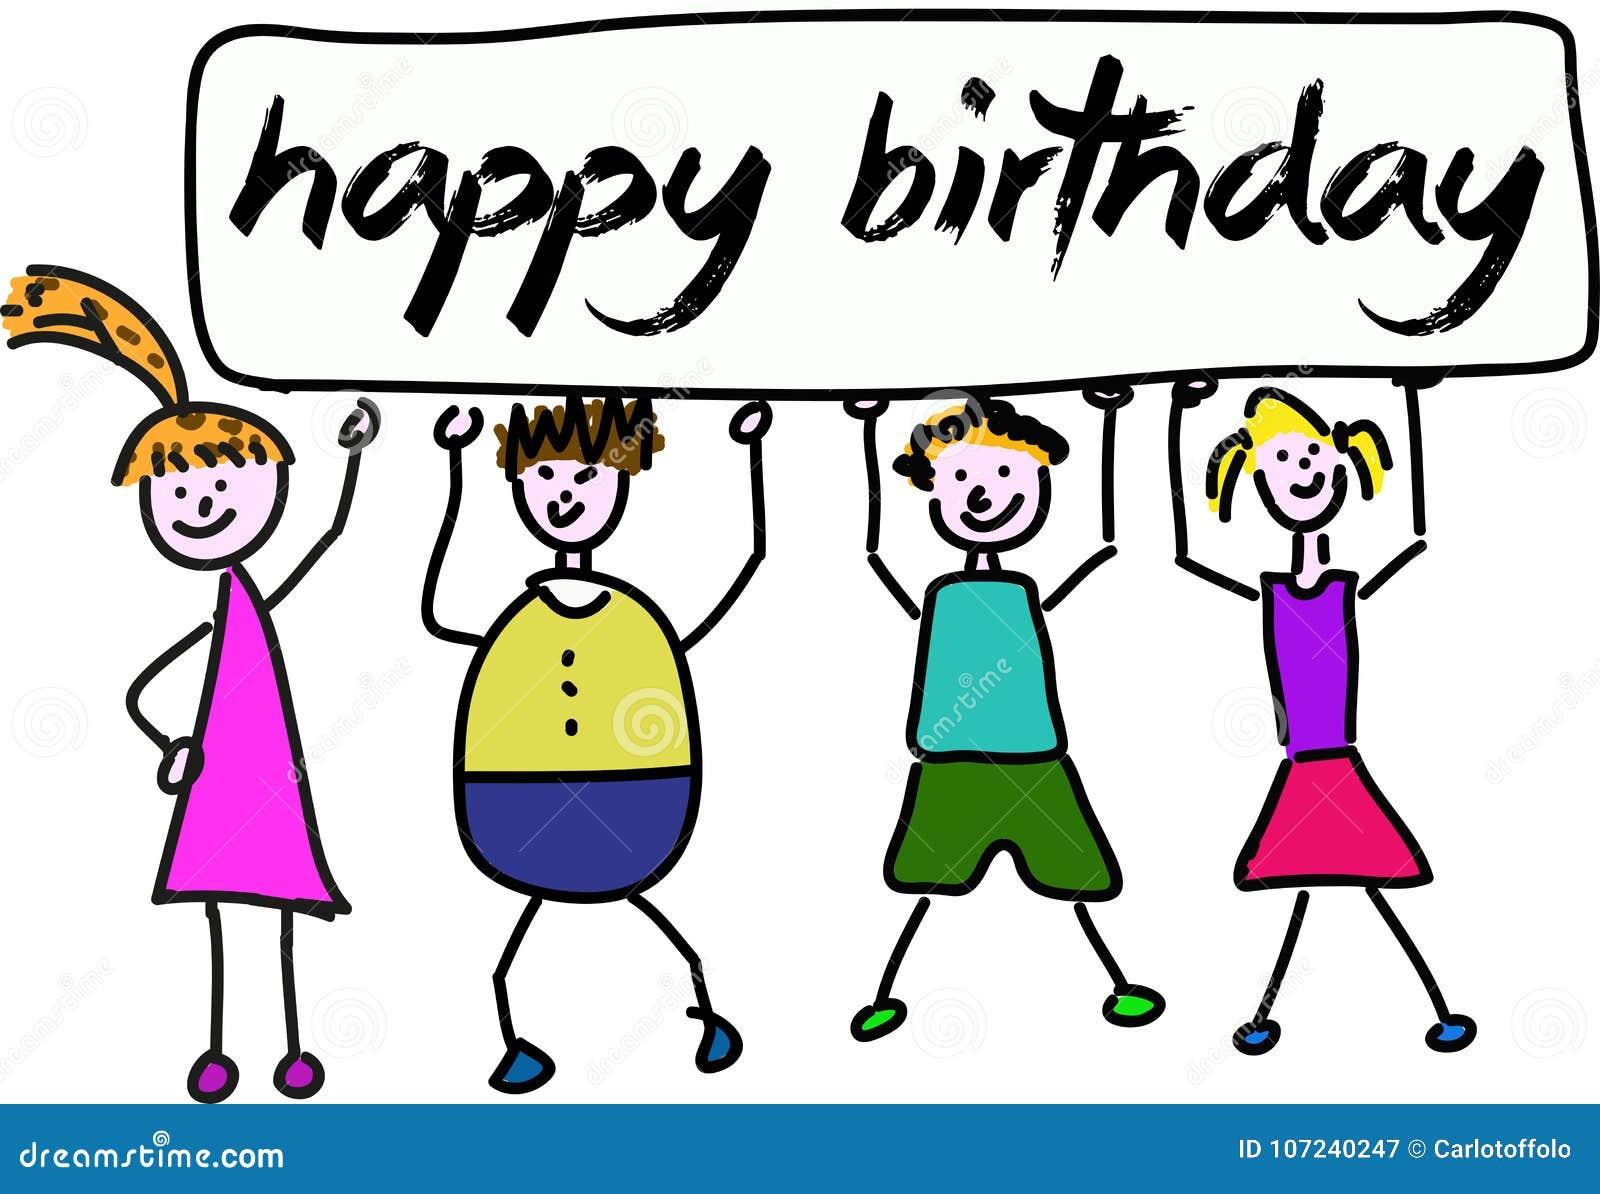 children holding banner happy birthday stock vector - illustration